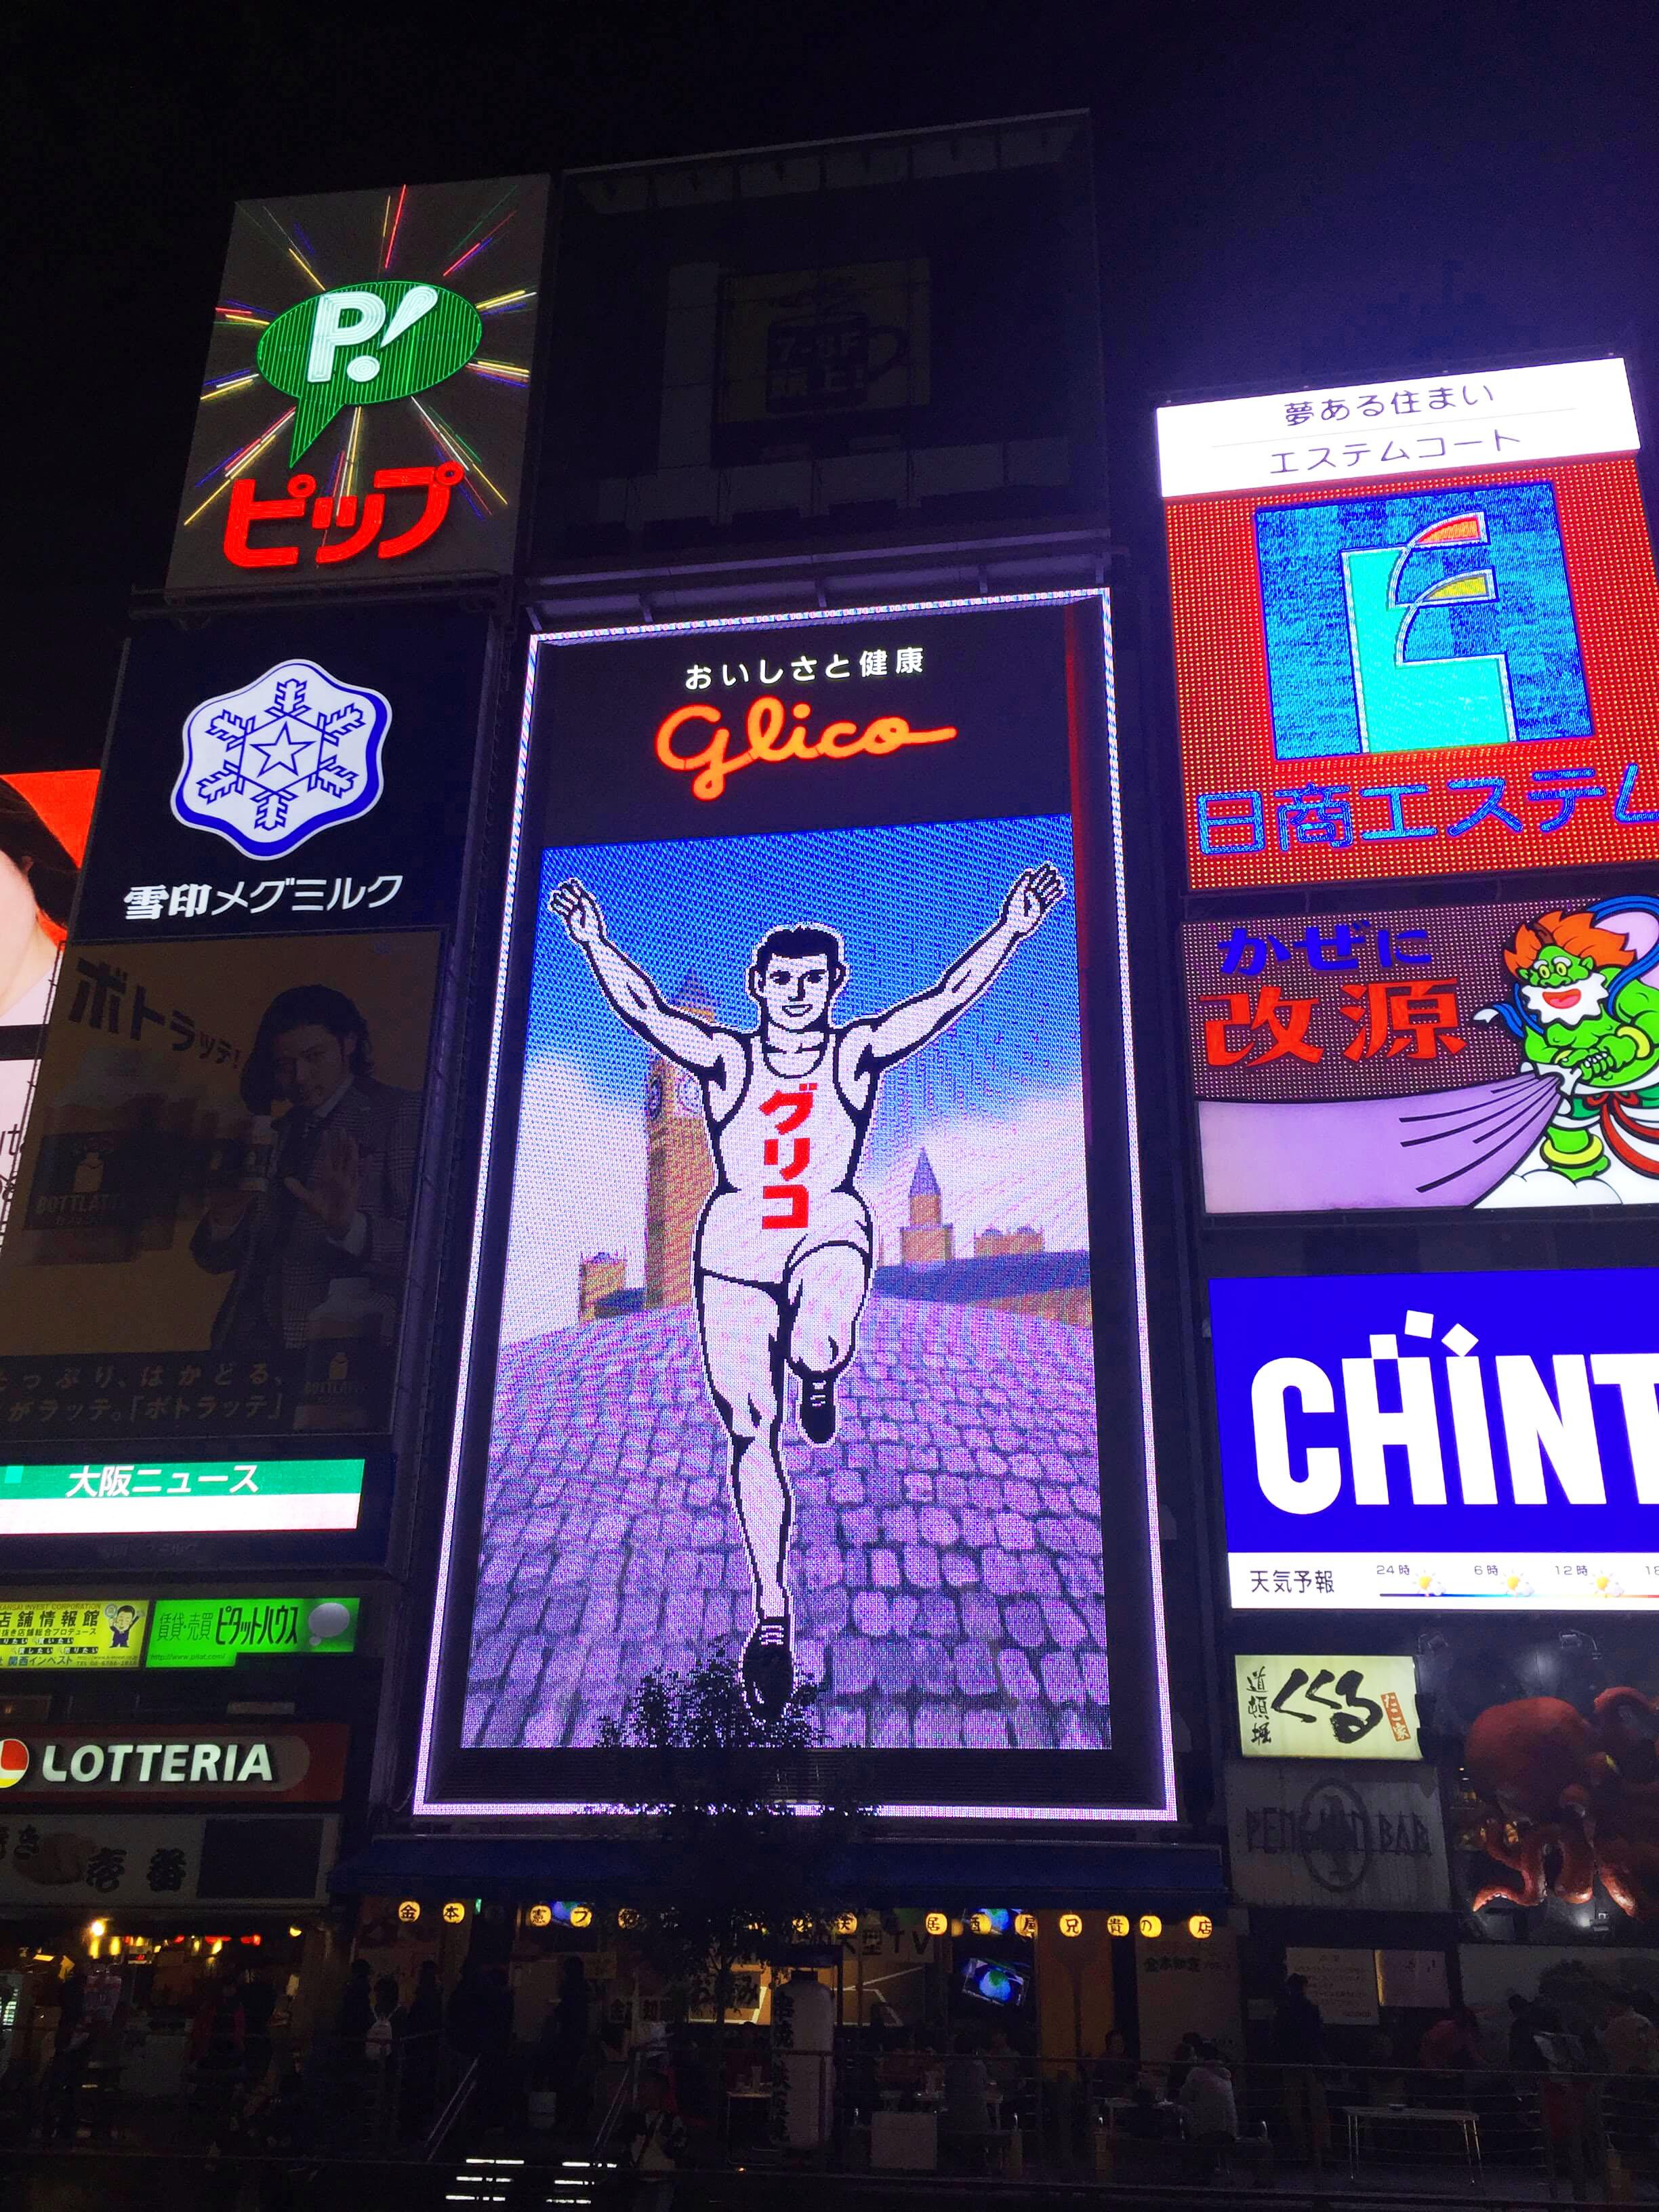 Dotonbori Glico in Osaka